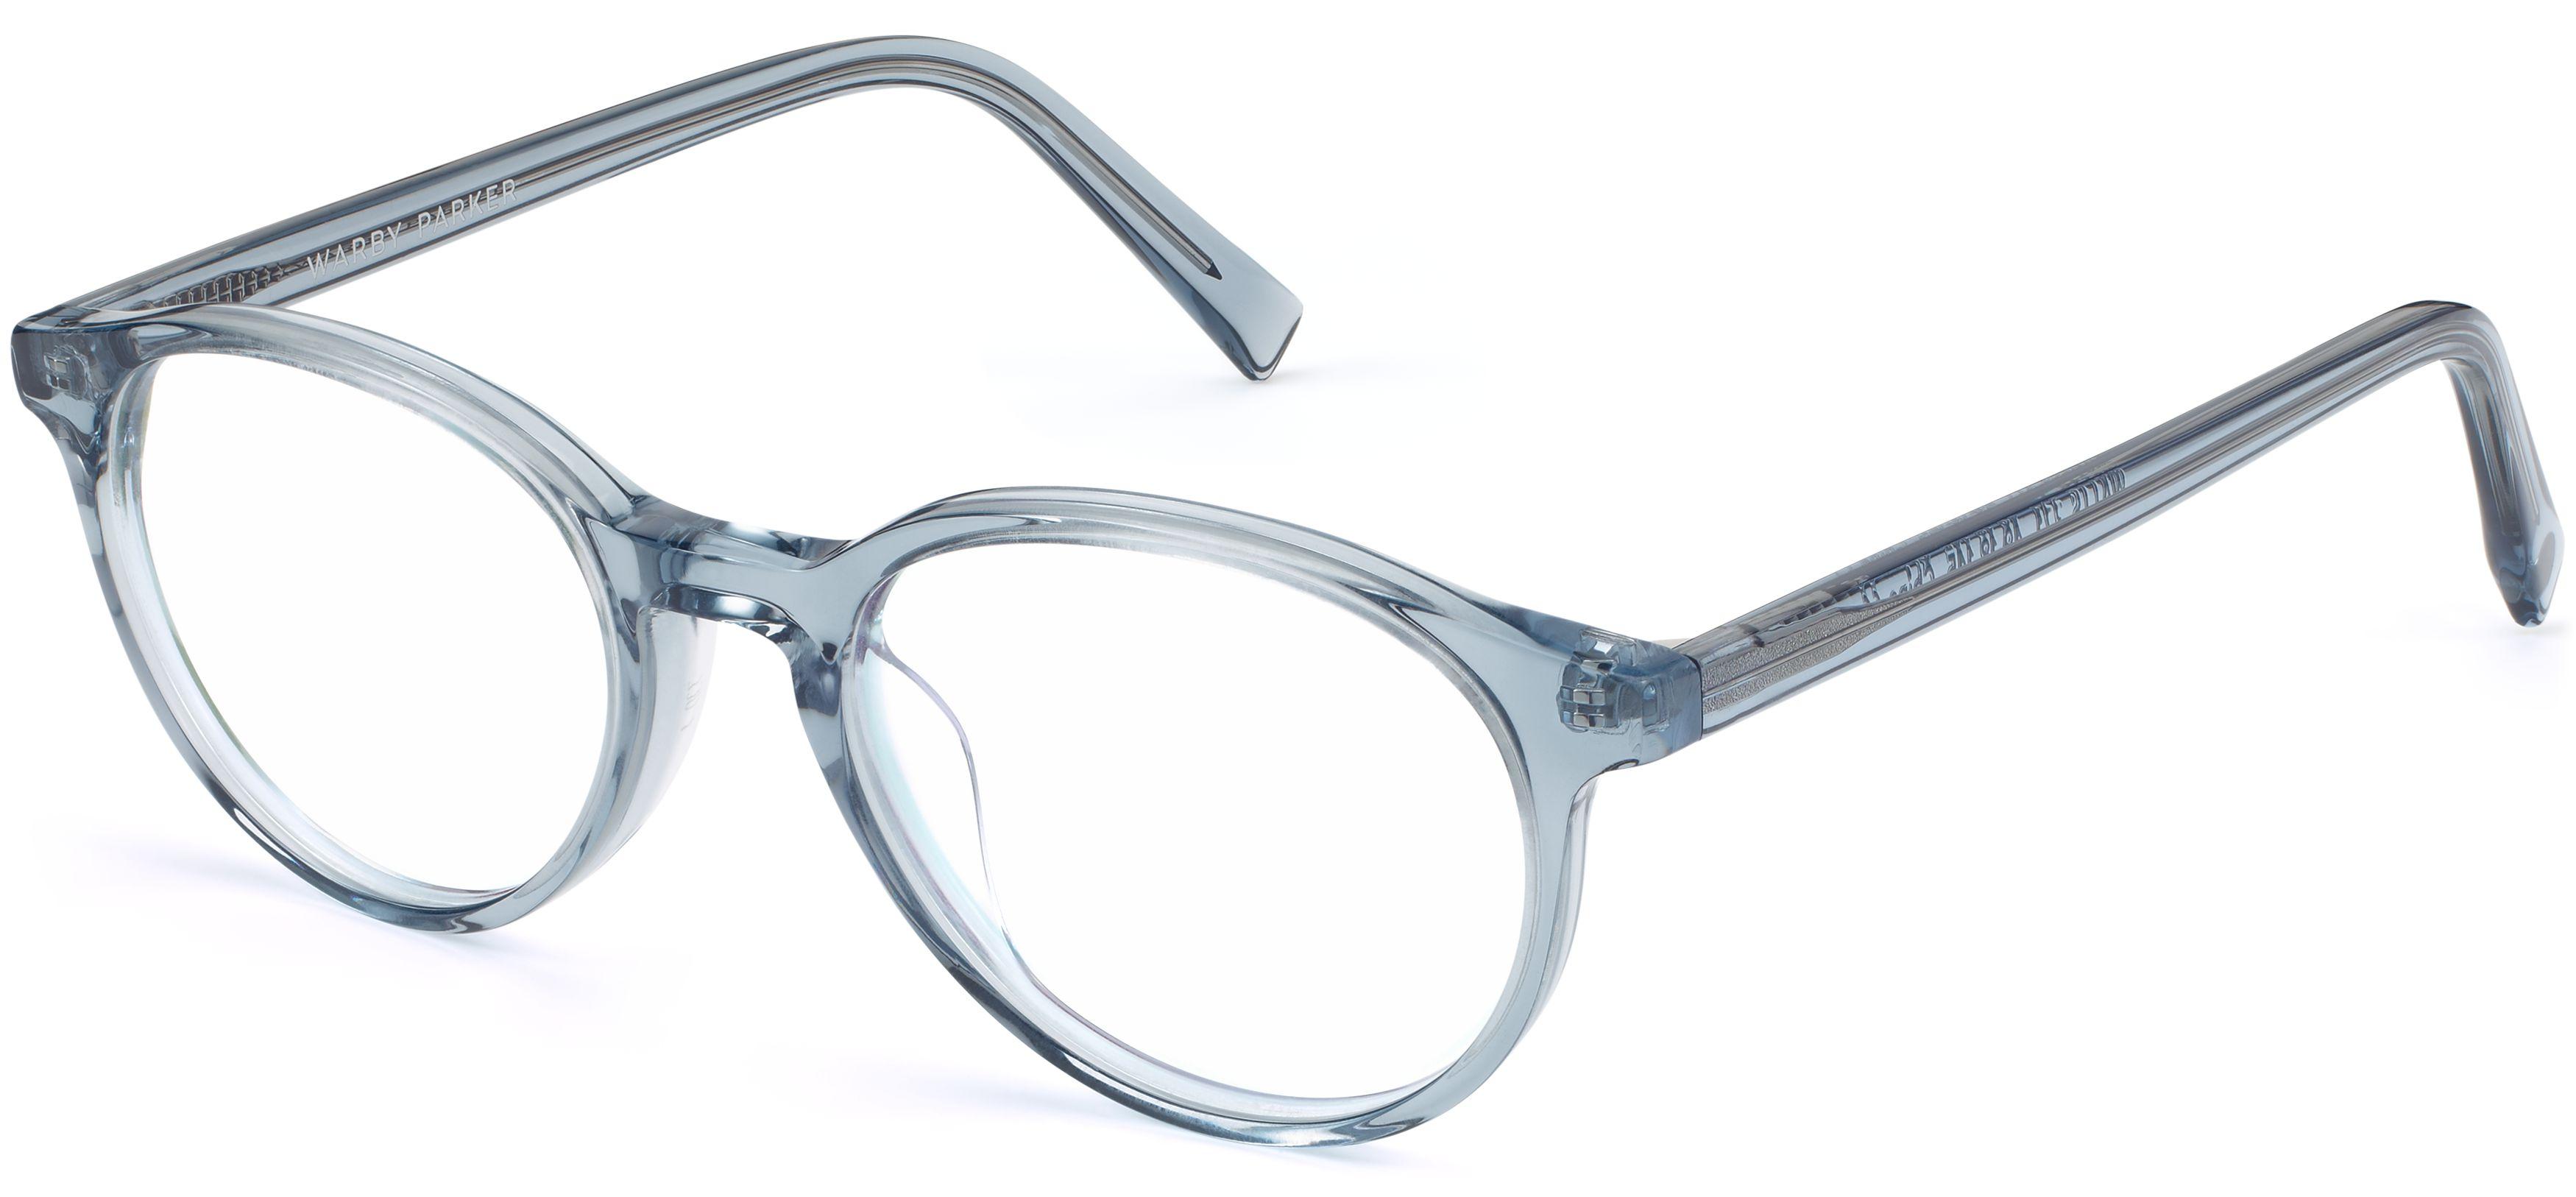 26cc9de95c1 Watts Eyeglasses in Pacific Crystal for Men